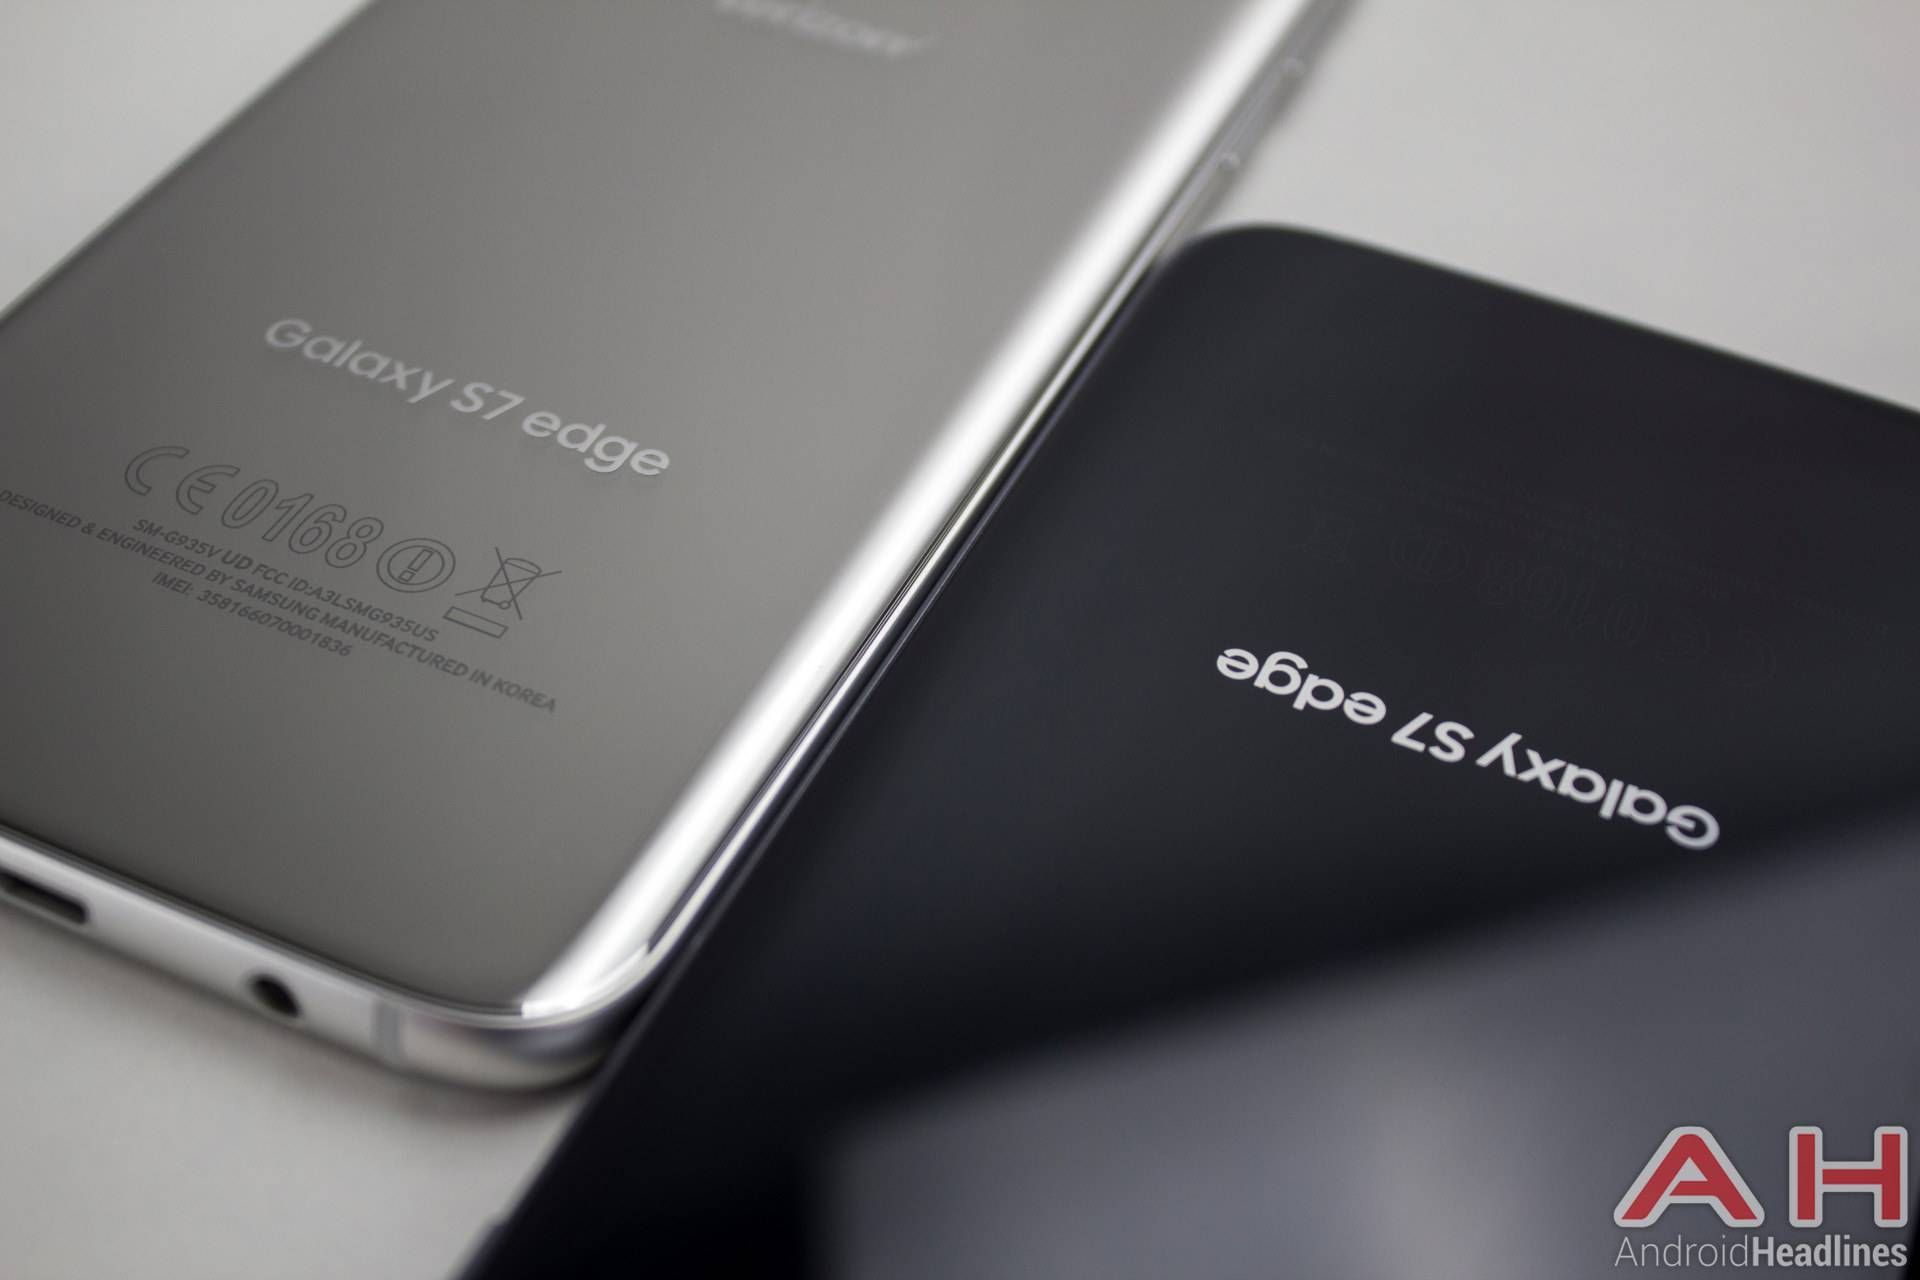 Galaxy S7, S7 Edge Get November Security Update In Europe